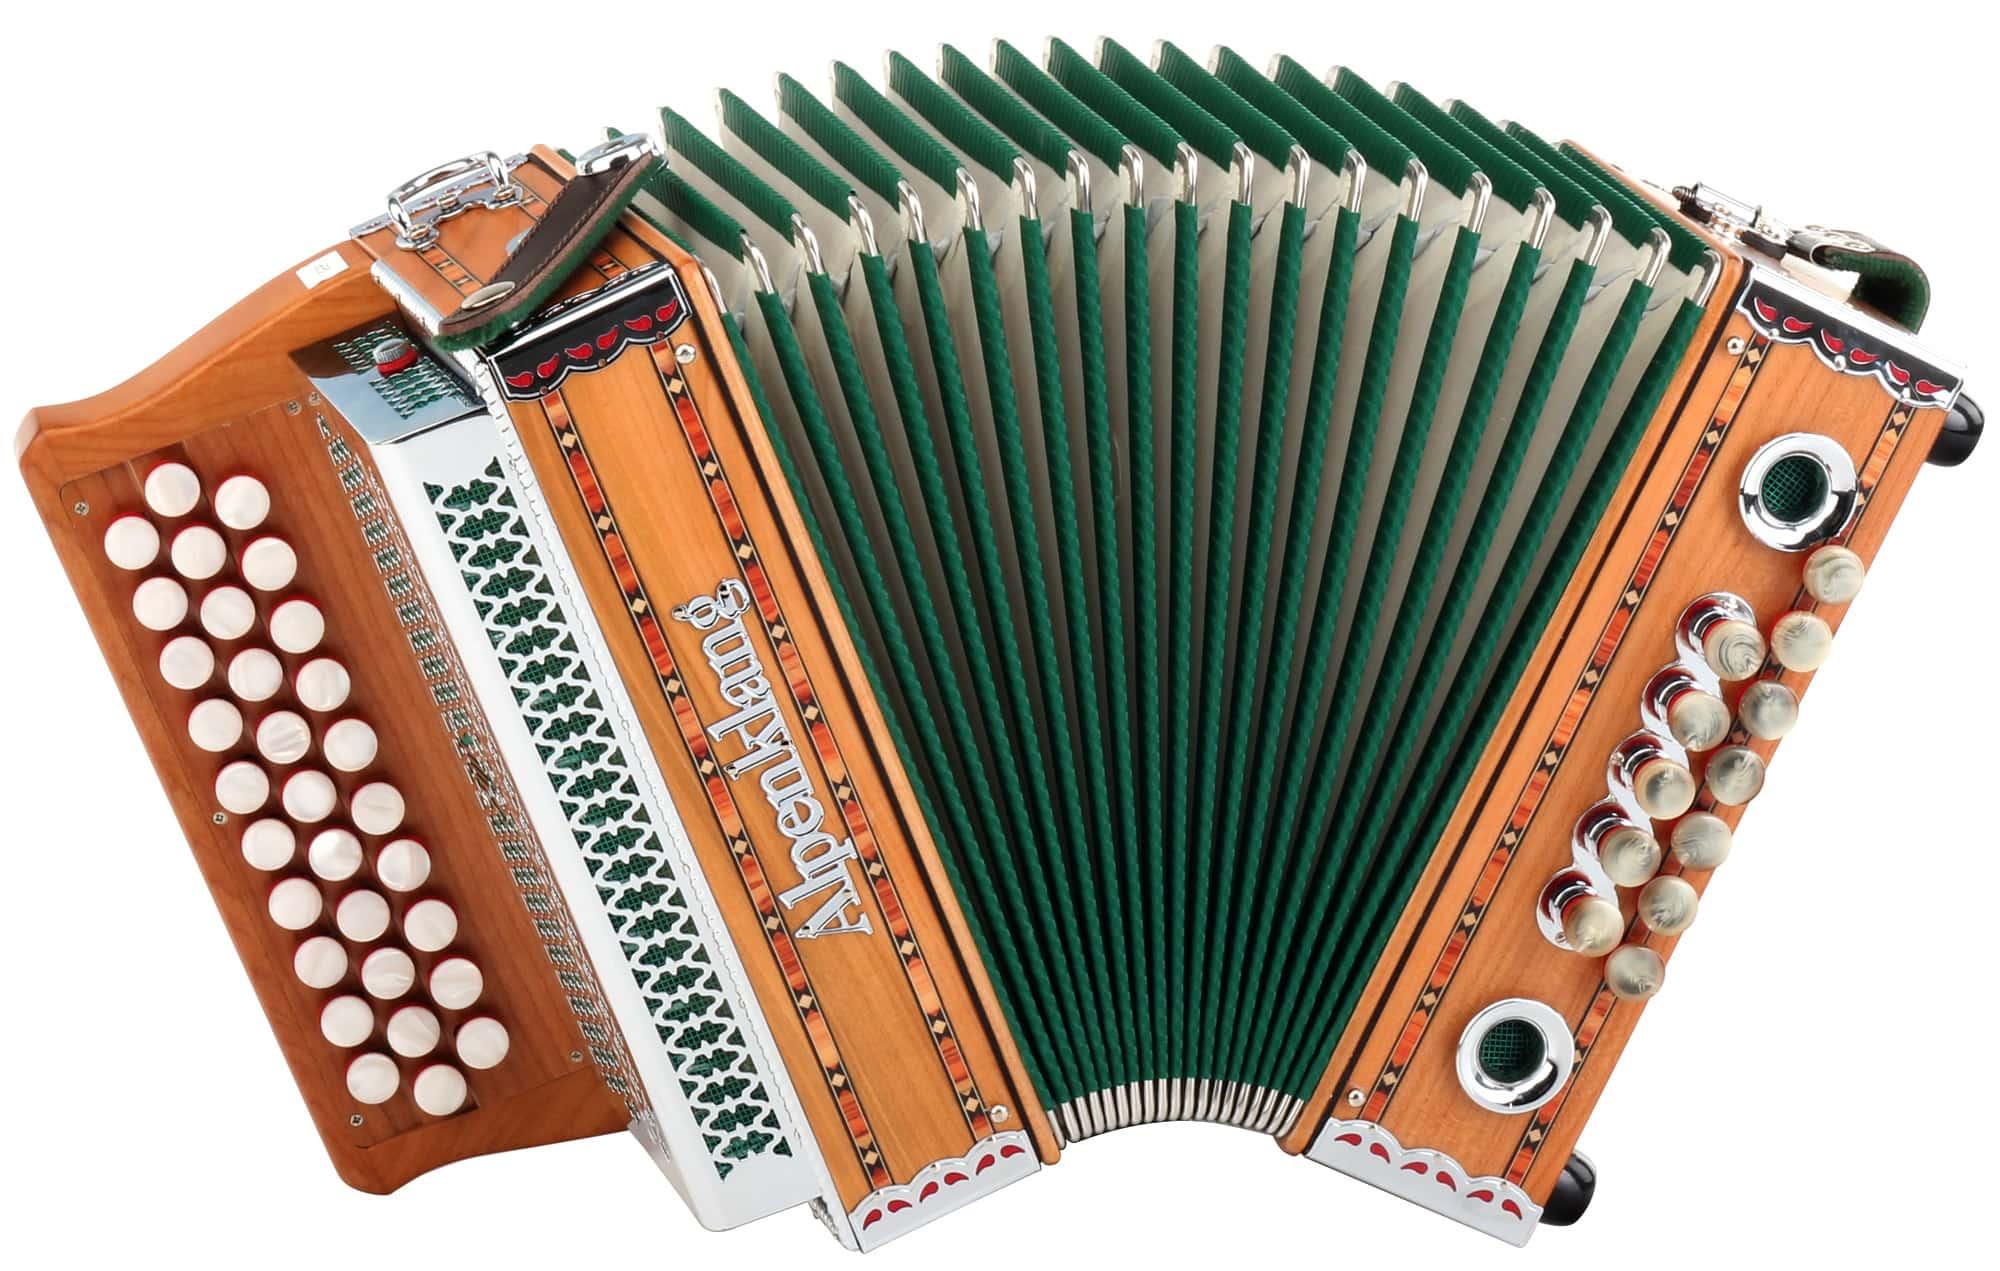 Alpenklang Harmonika 'Mini' 3 reihig, G C F massiv aus Kirschholz